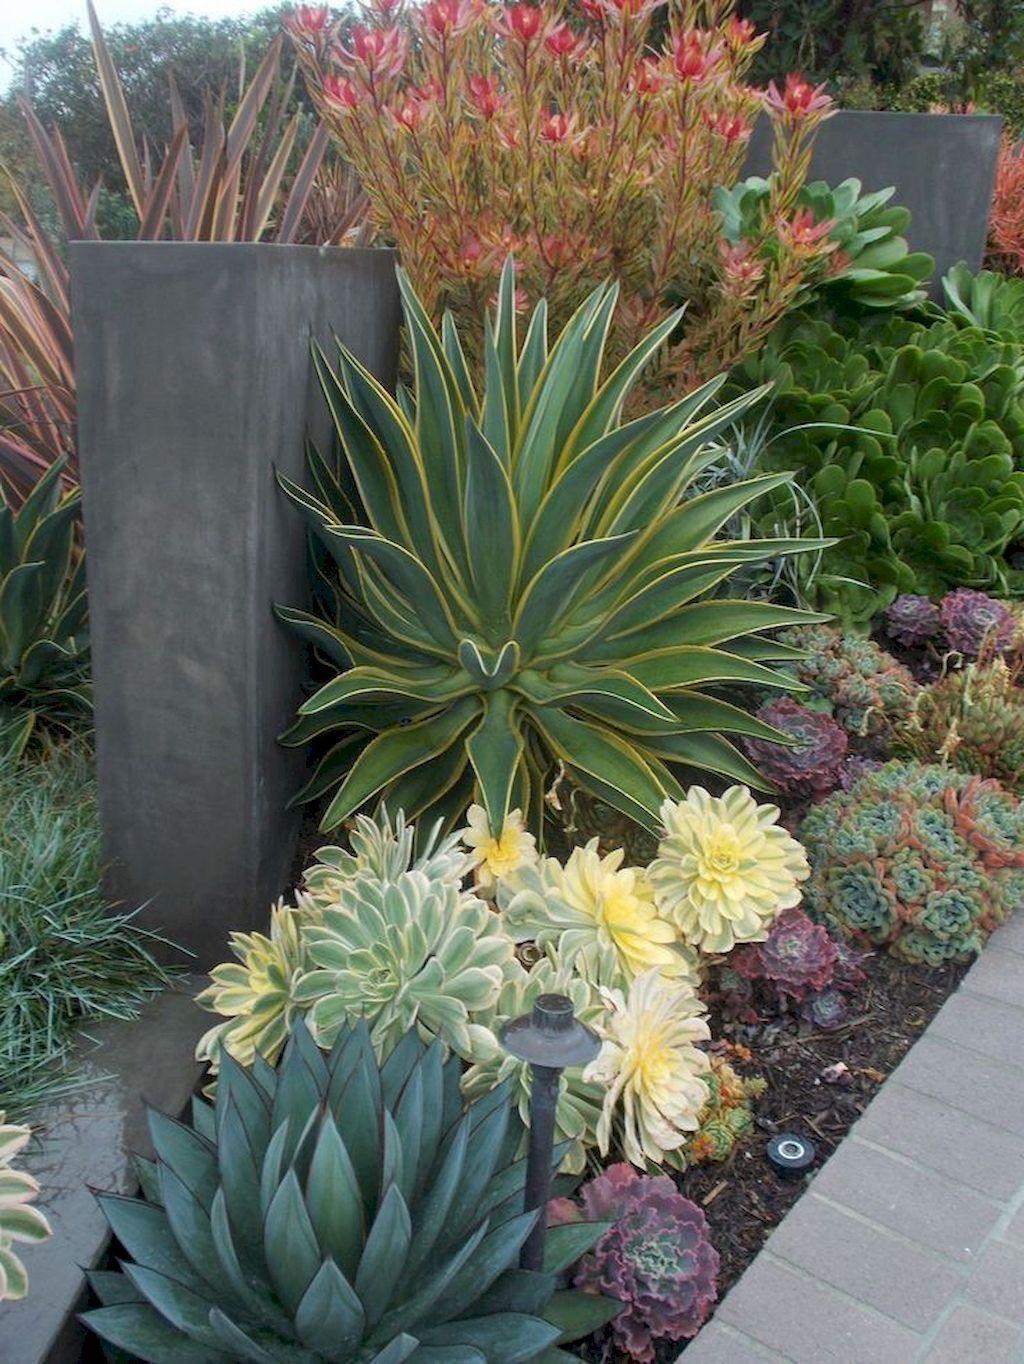 16 Simple Low Maintenance Front Yard Landscaping Ideas Drought Tolerant Garden Succulent Landscaping Xeriscape